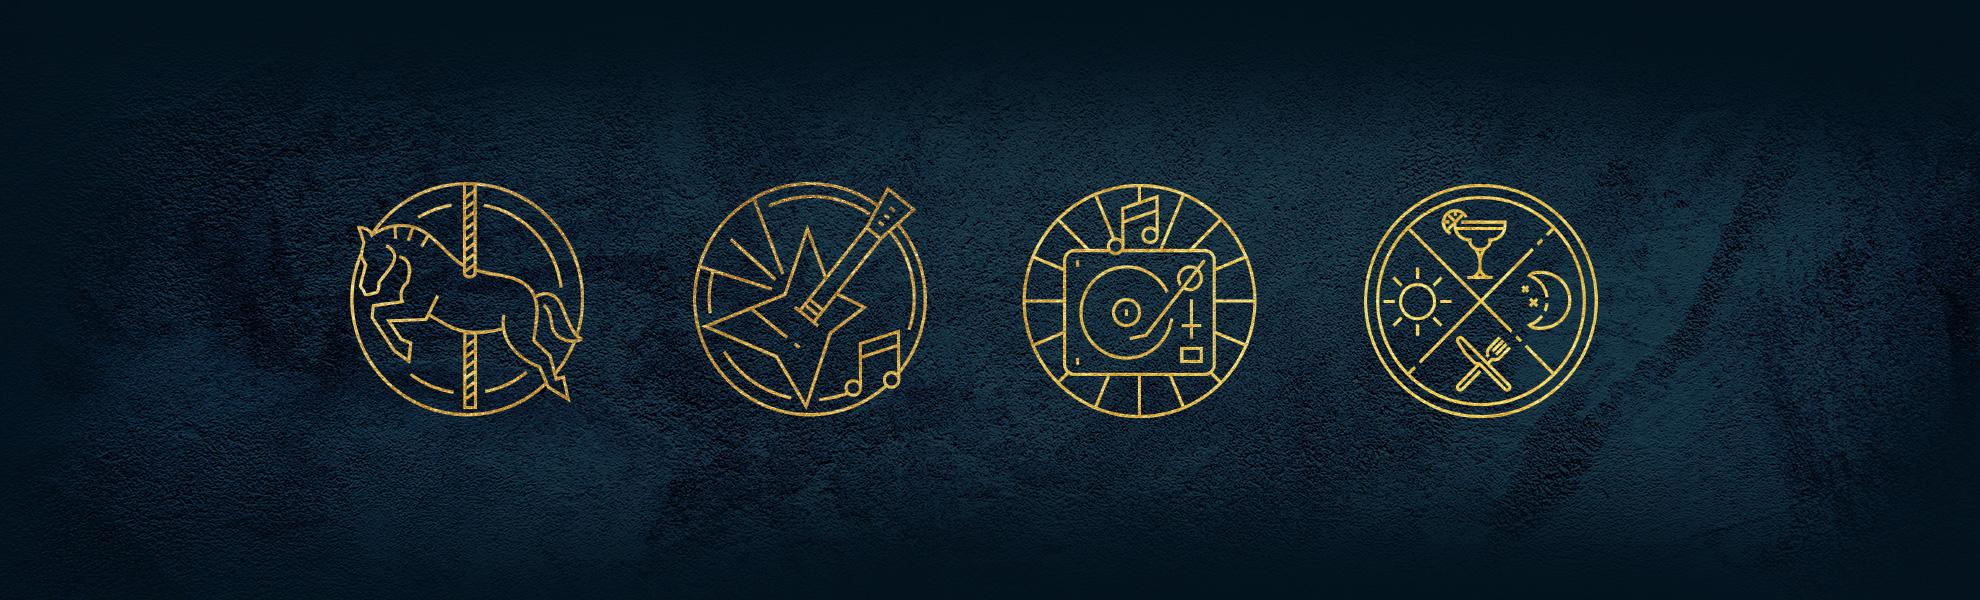 Stadsoase icons